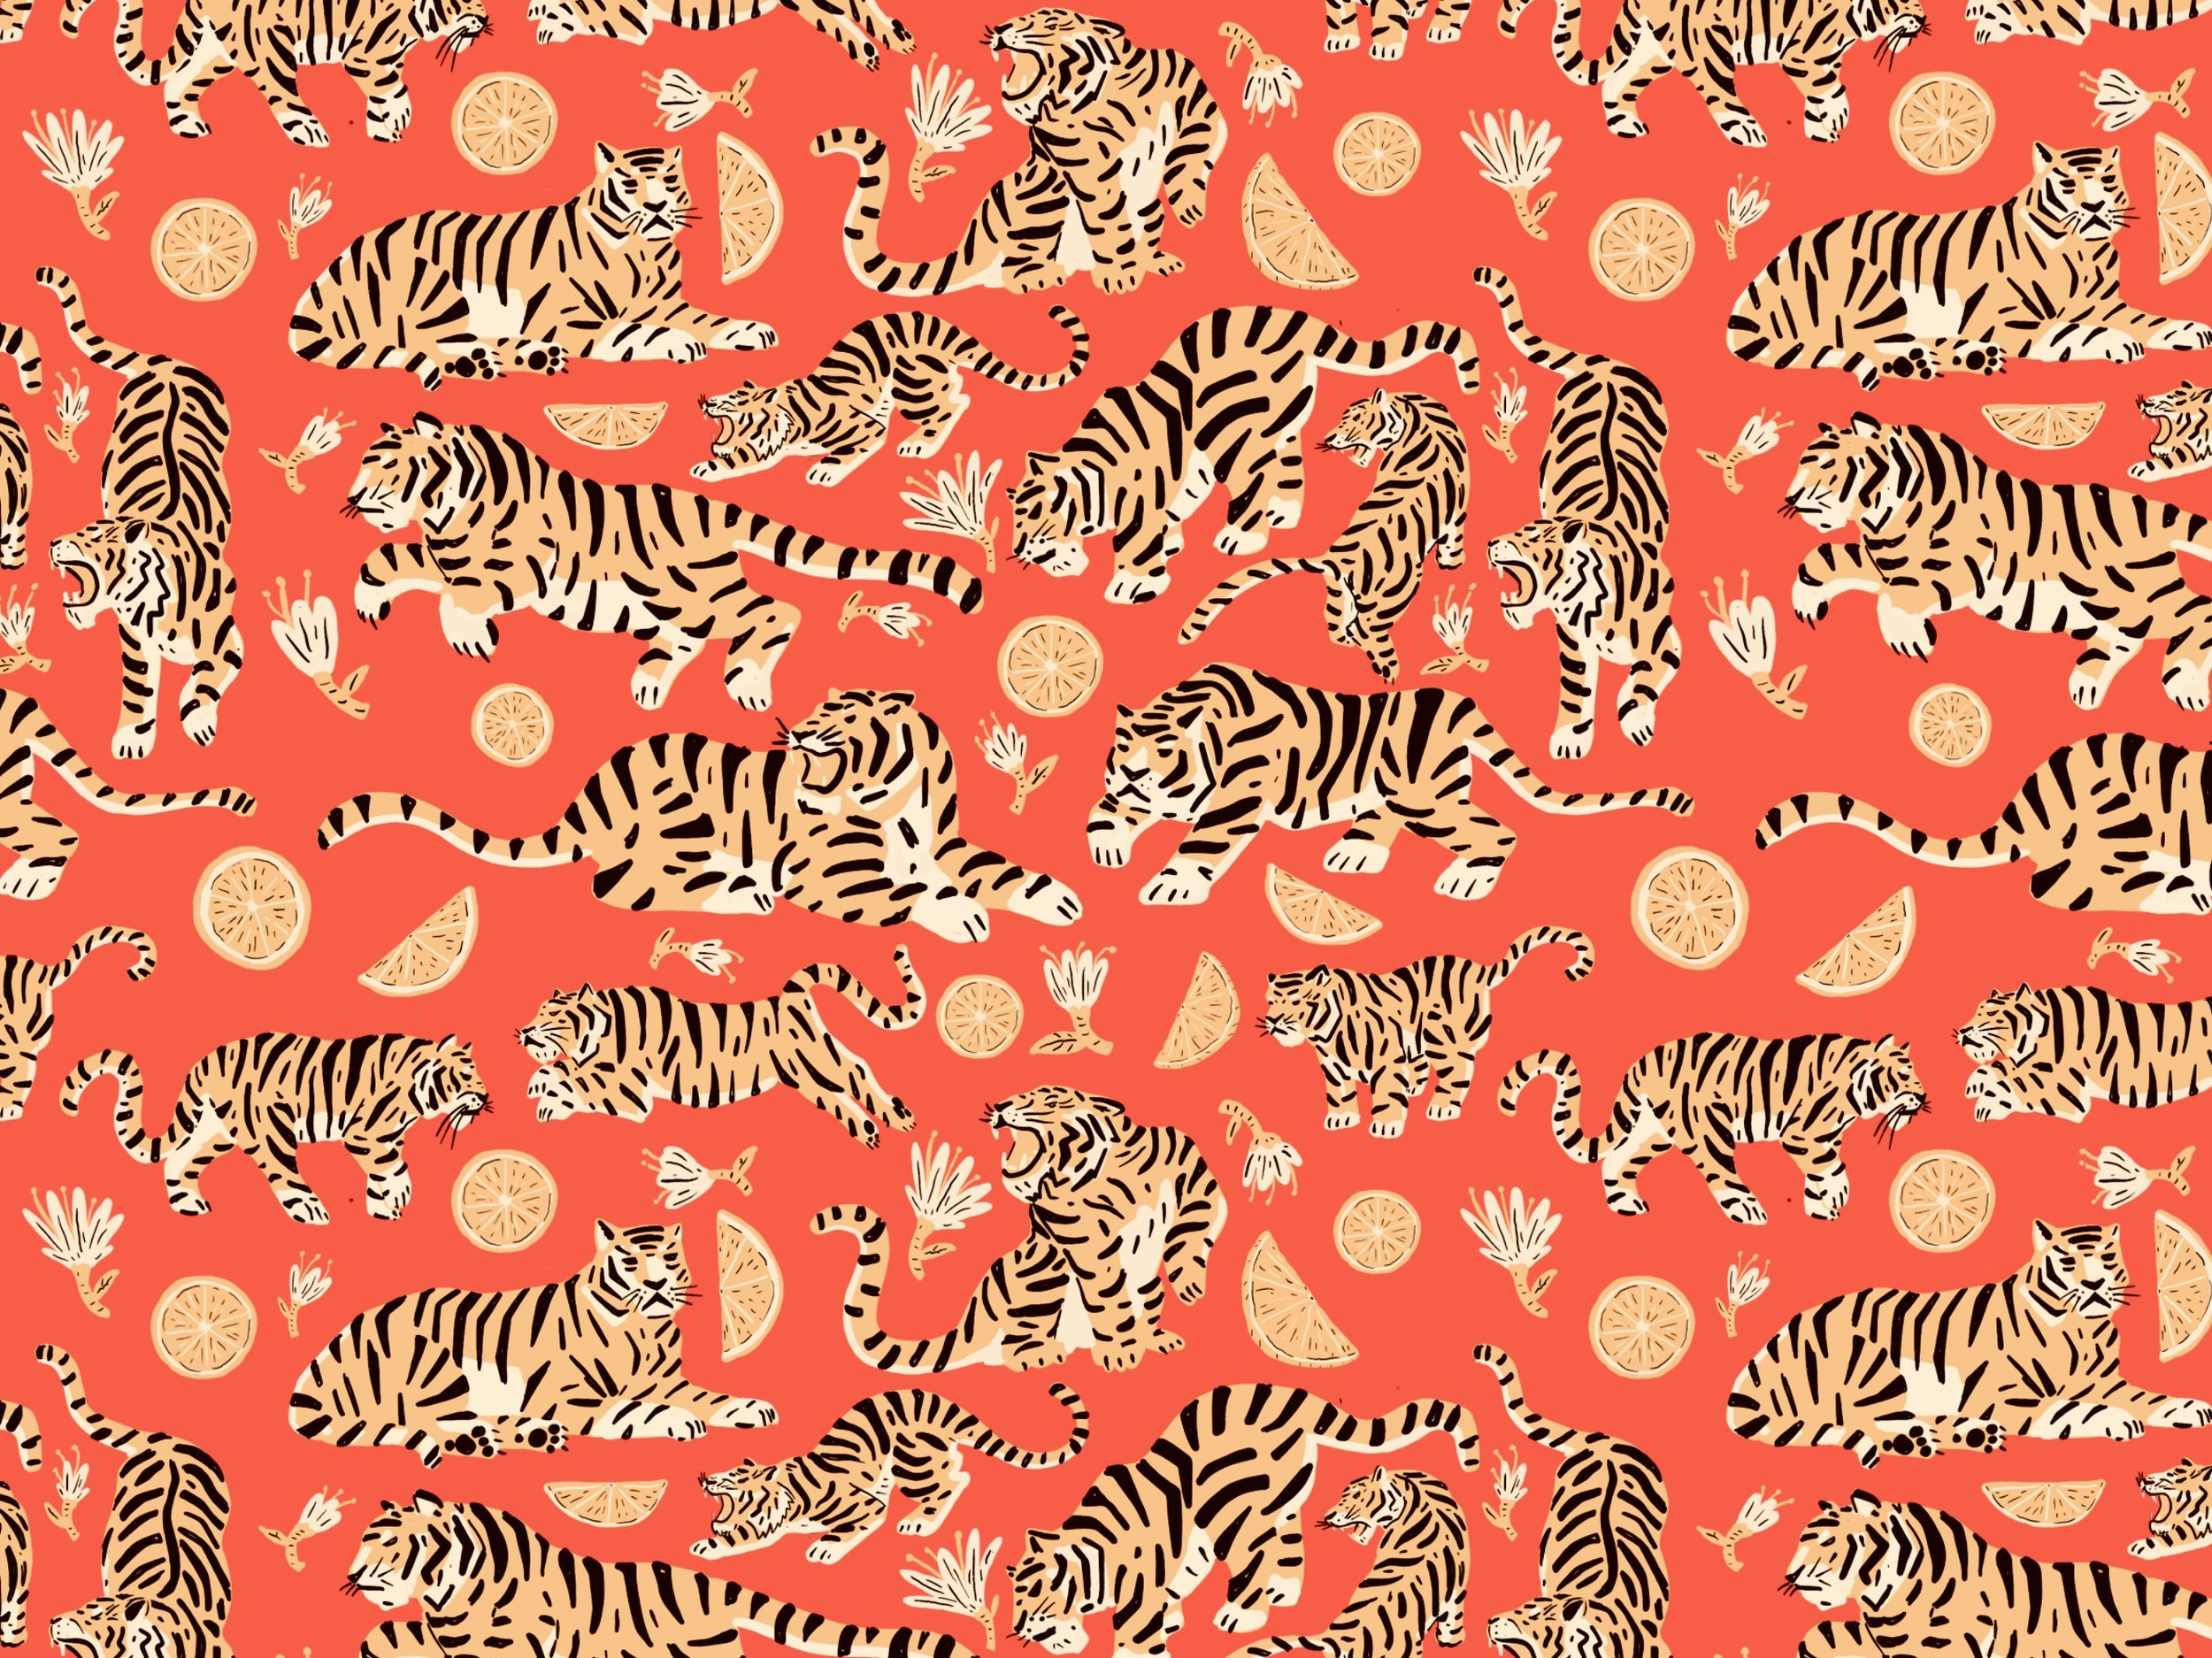 tiger pattern.jpg